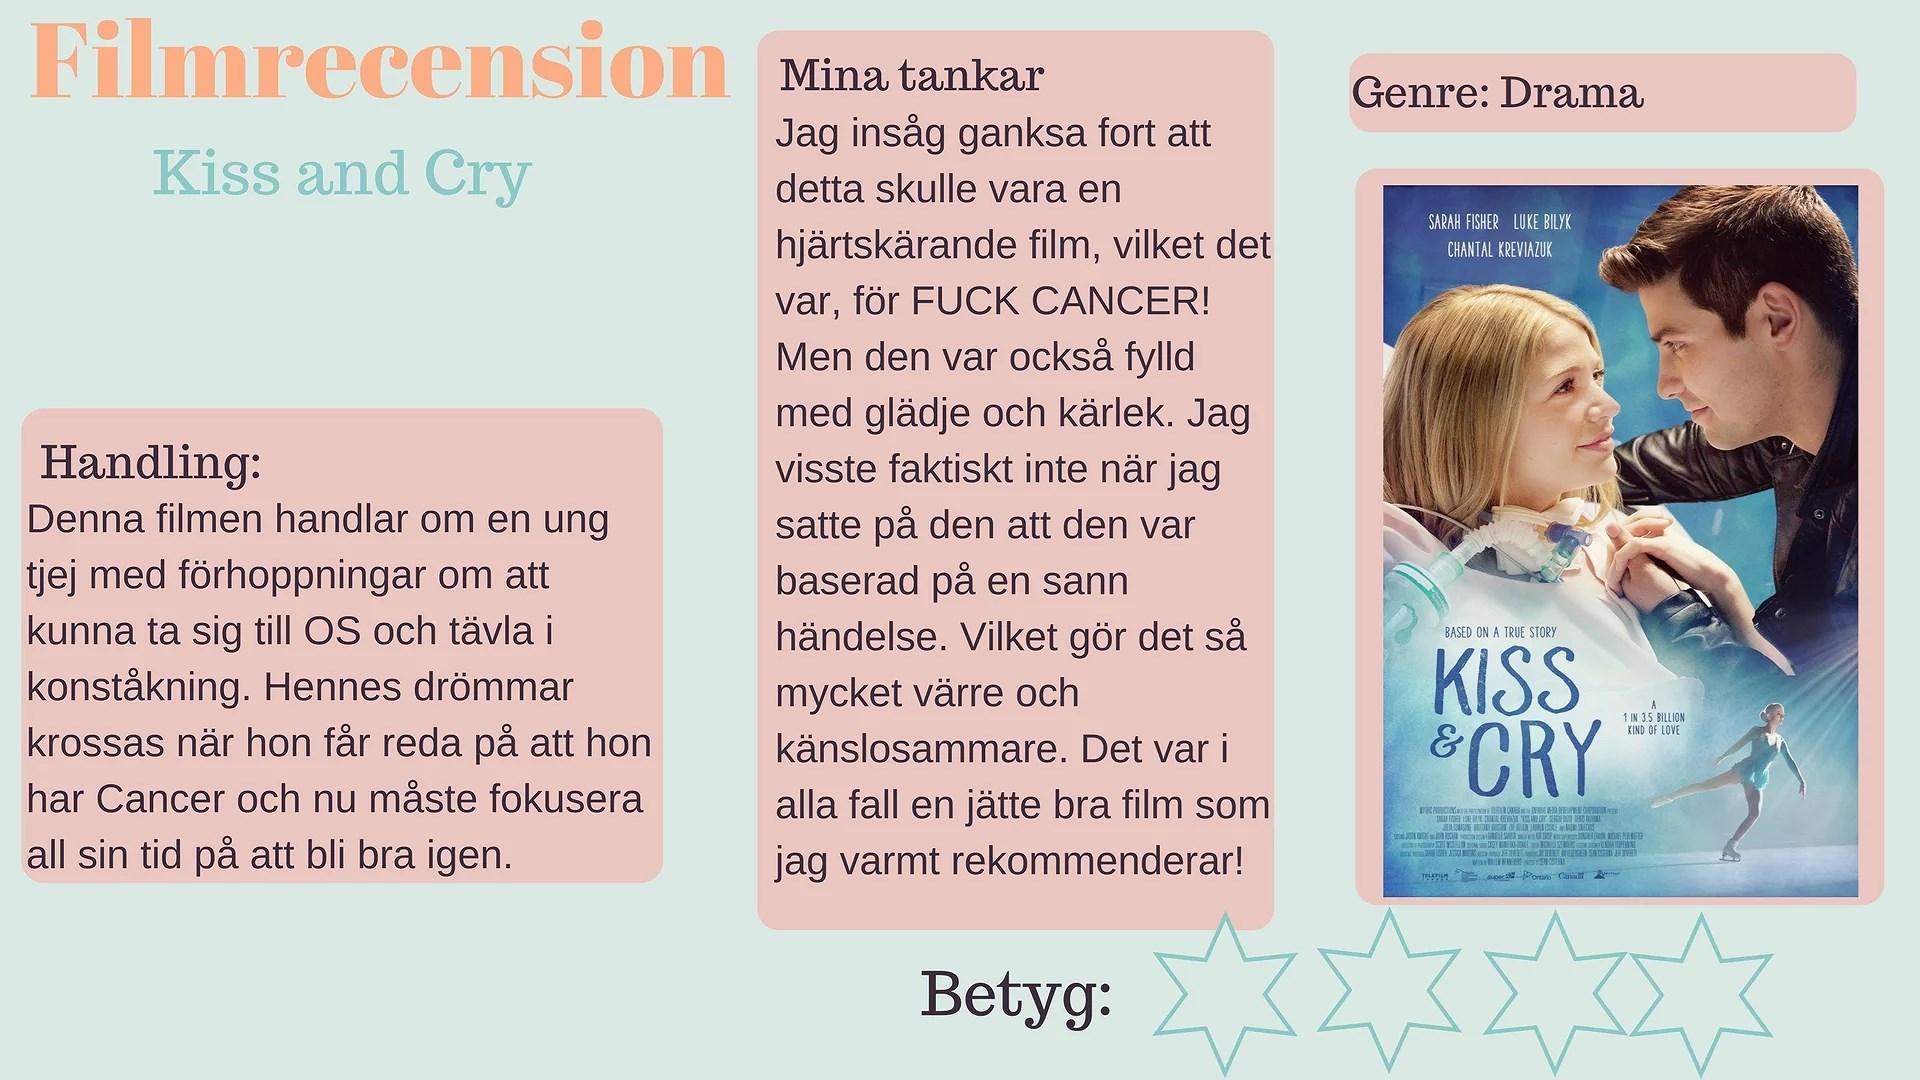 Filmrecension - Kiss & Cry